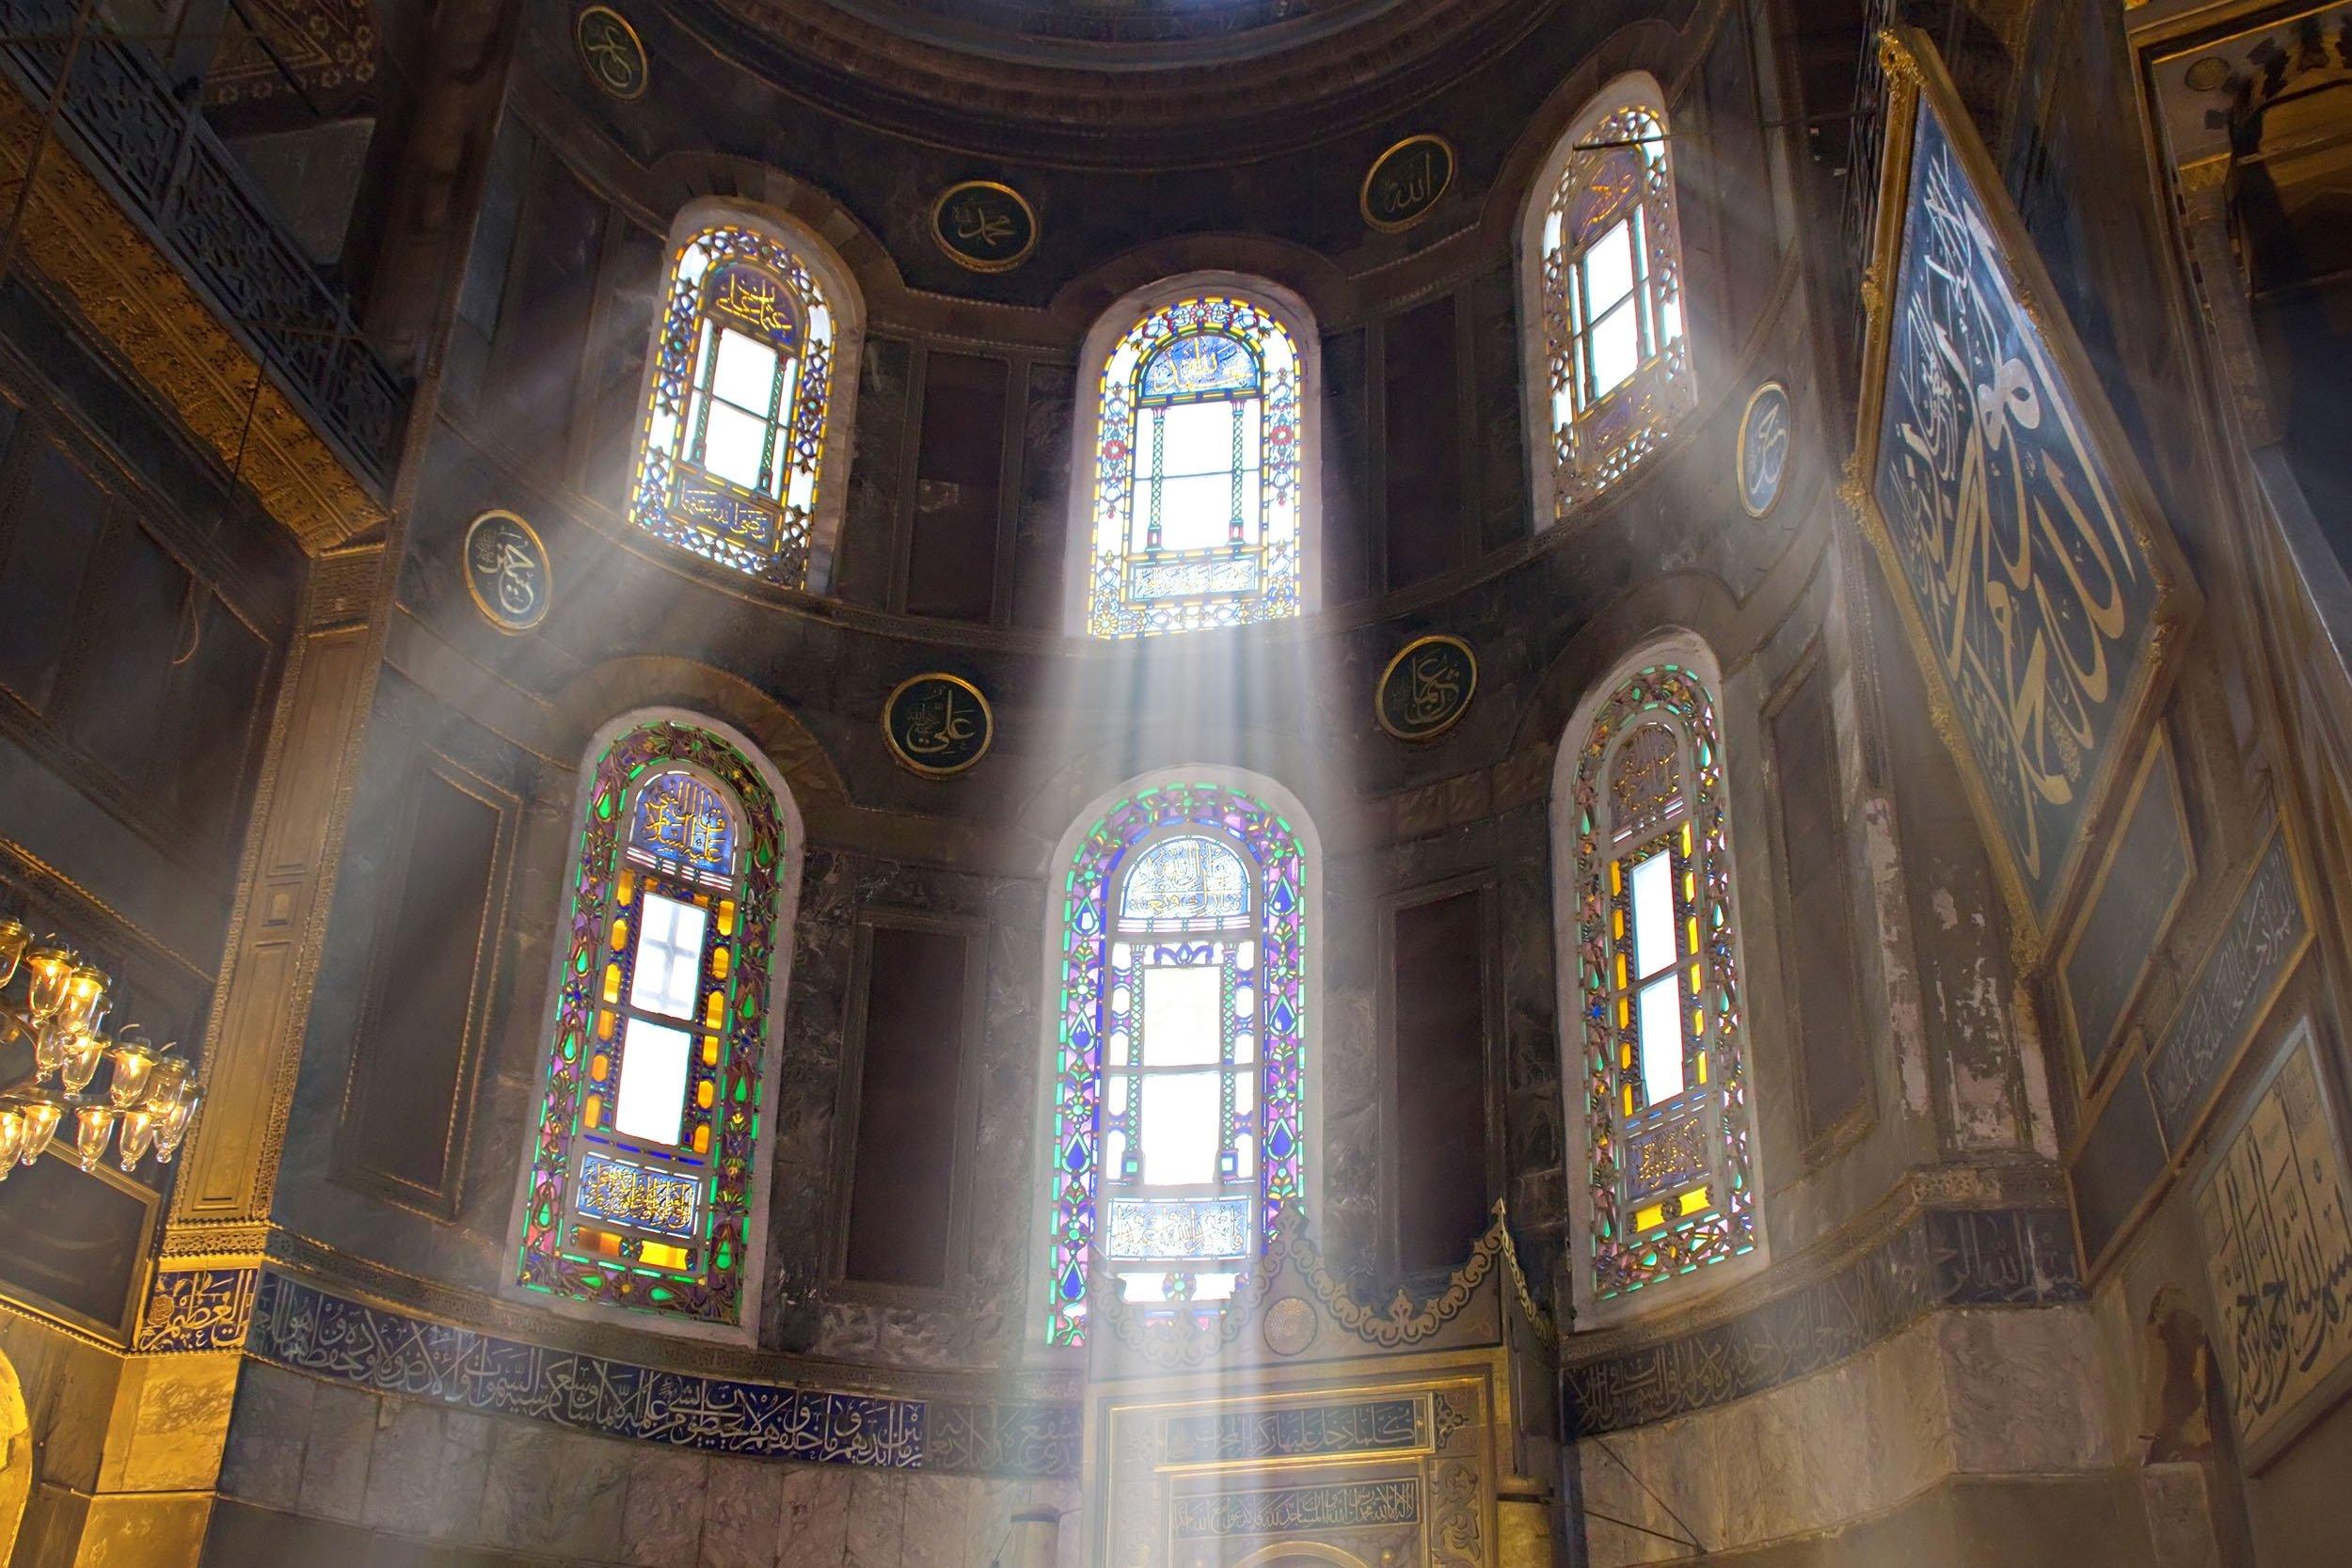 Sun shines through the glass in the Hagia Sophia Grand Mosque in Sultanahmet,Istanbul, Turkey. (Shutterstock Photo)